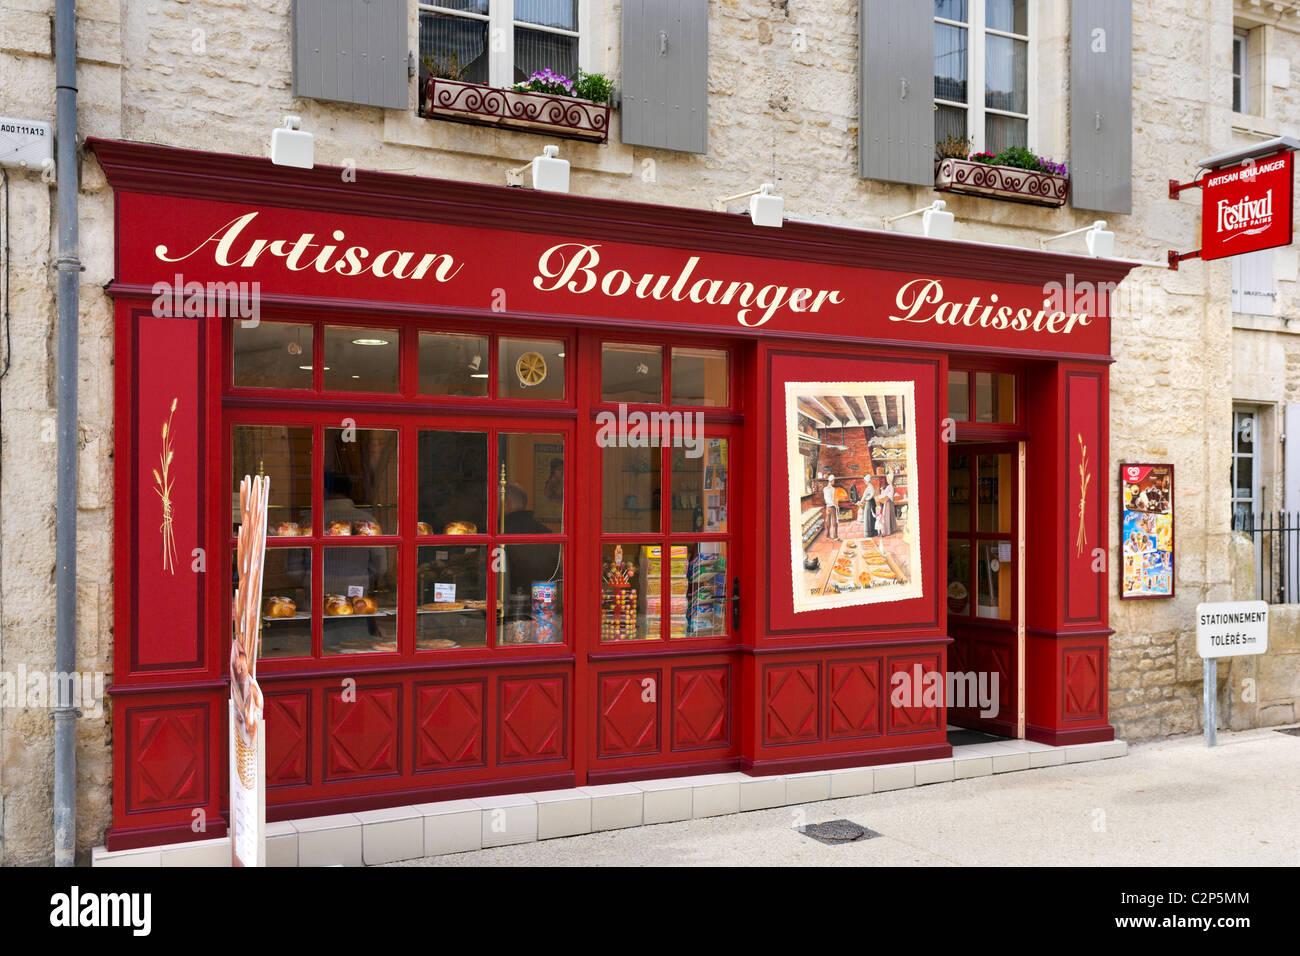 Traditional Boulangerie/Patisserie in the village centre, Coulon, Marais Poitevin, Poitou Charentes, France - Stock Image